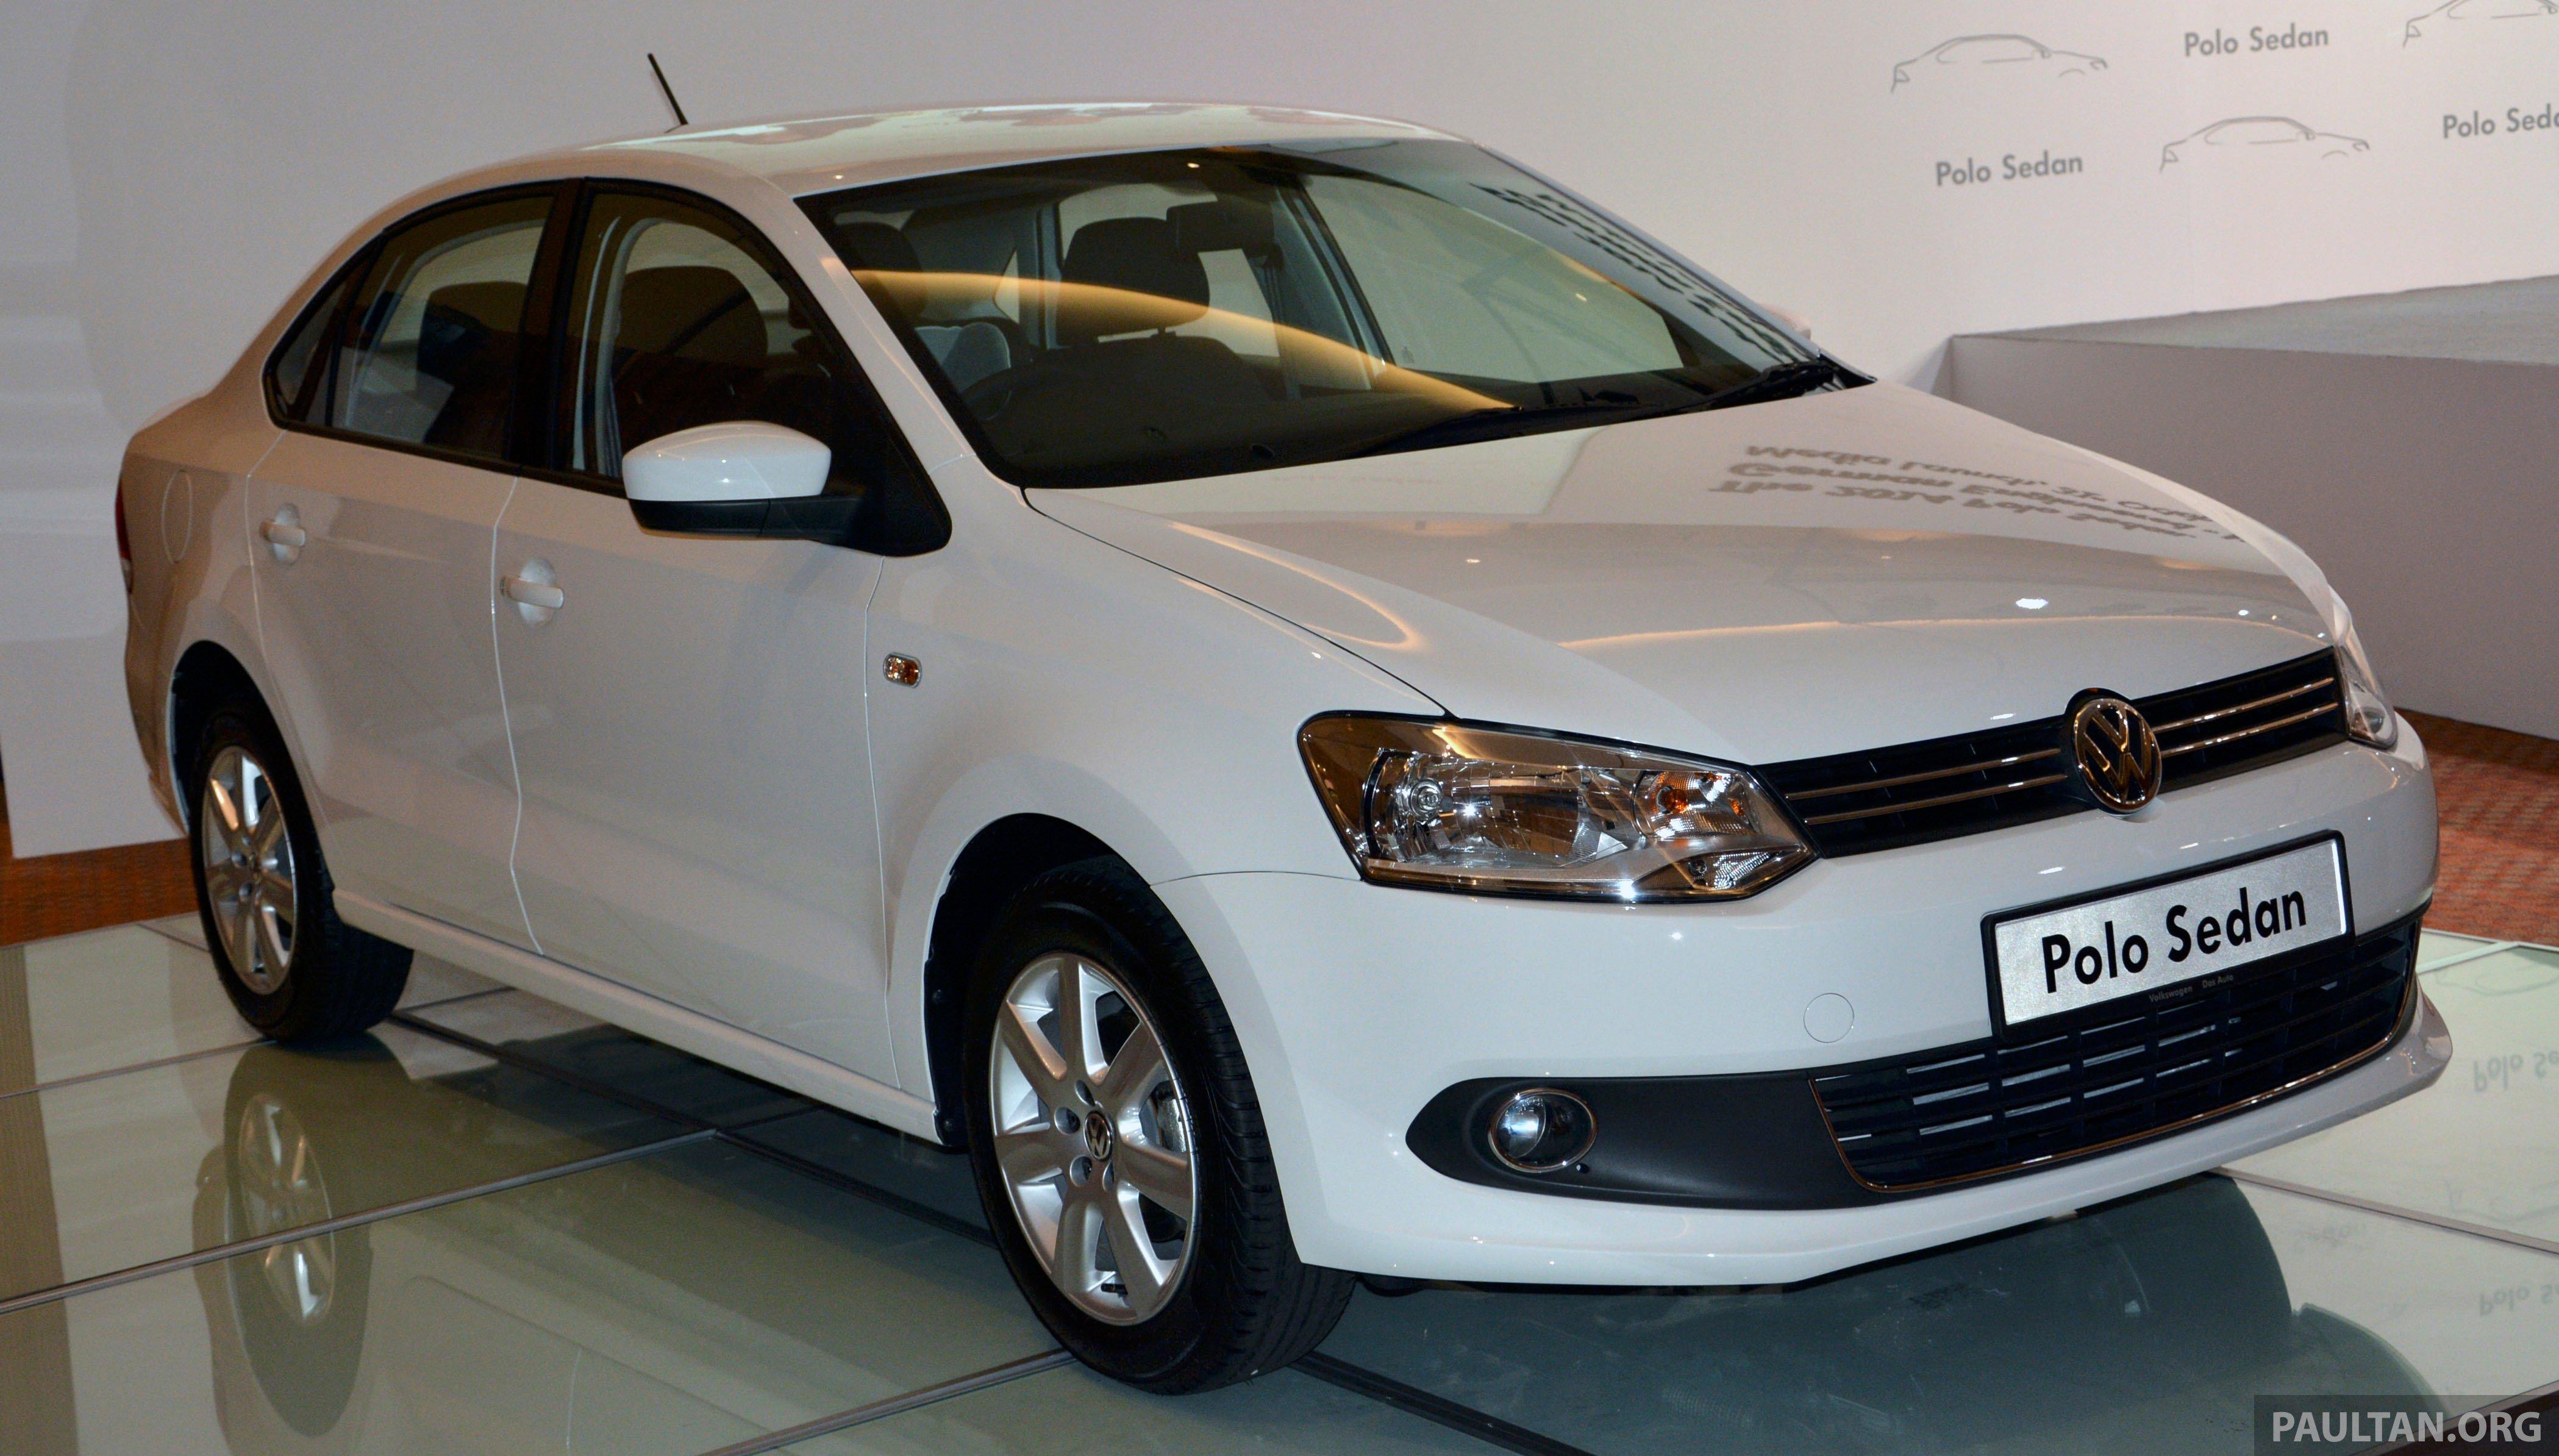 2014 Volkswagen Polo Sedan Ckd Launched Rm86k Paul Tan